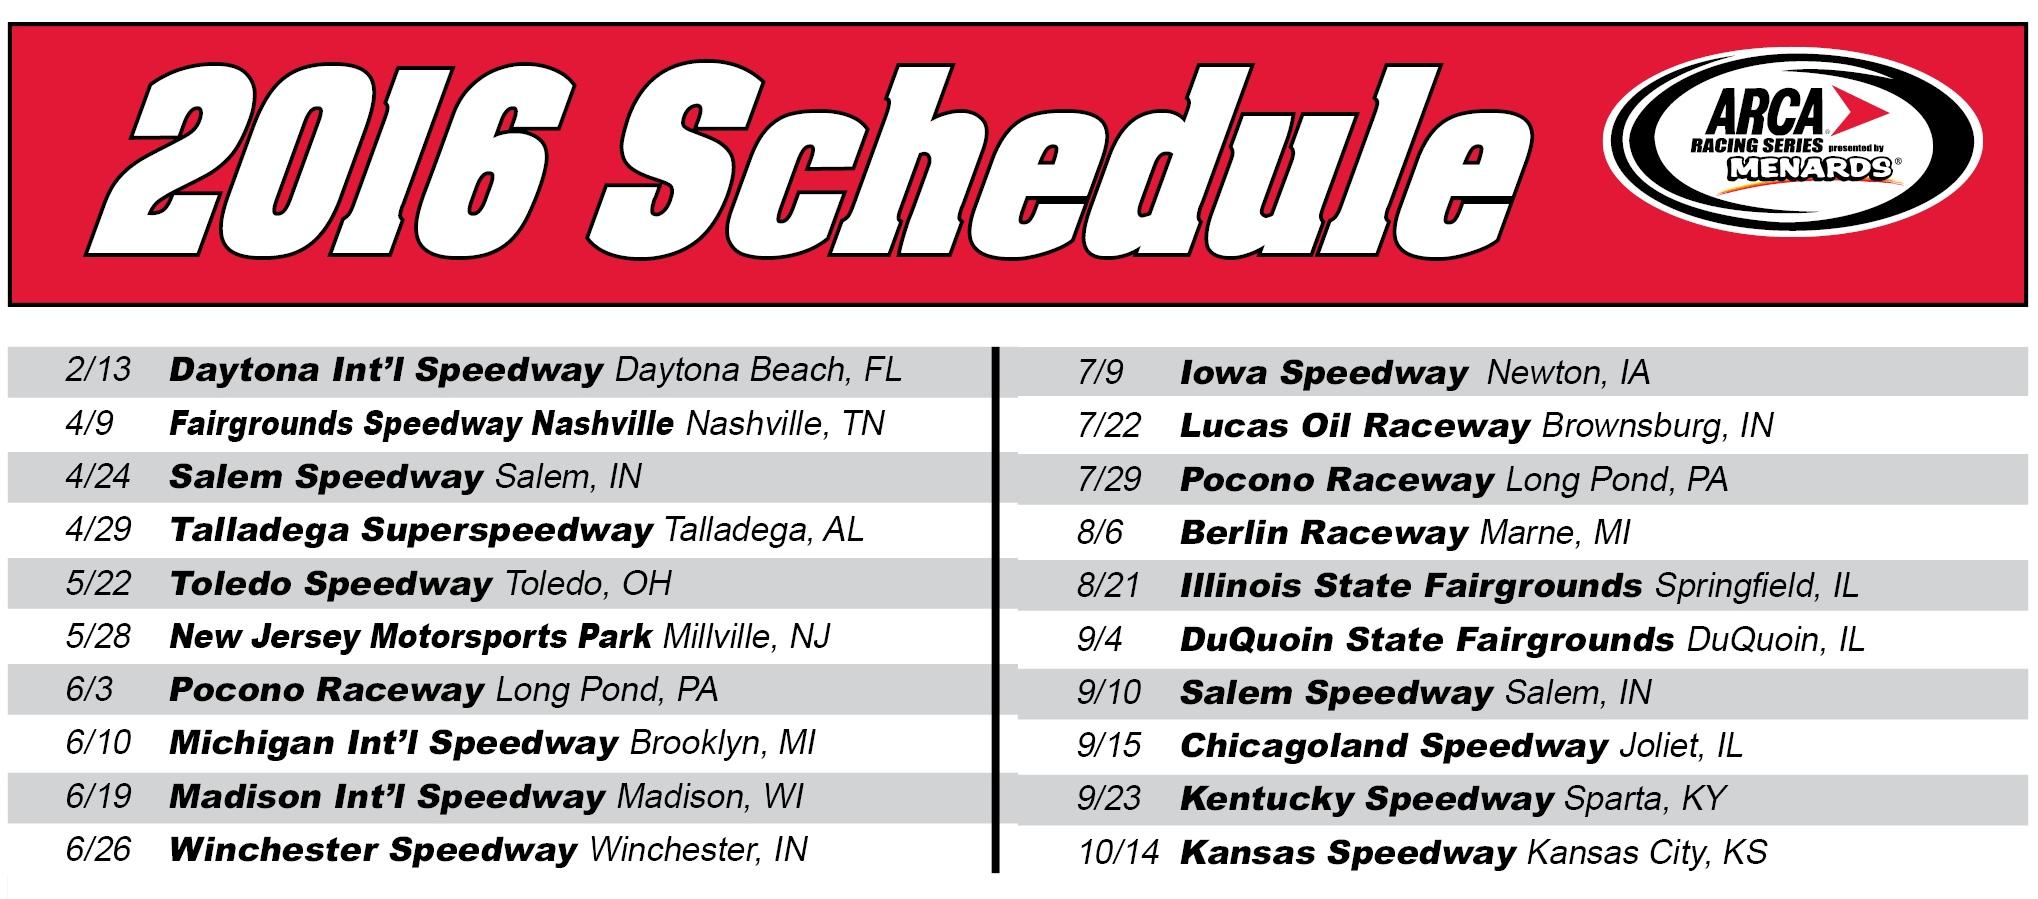 2016 Nascar Race Schedule | Calendar Template 2016